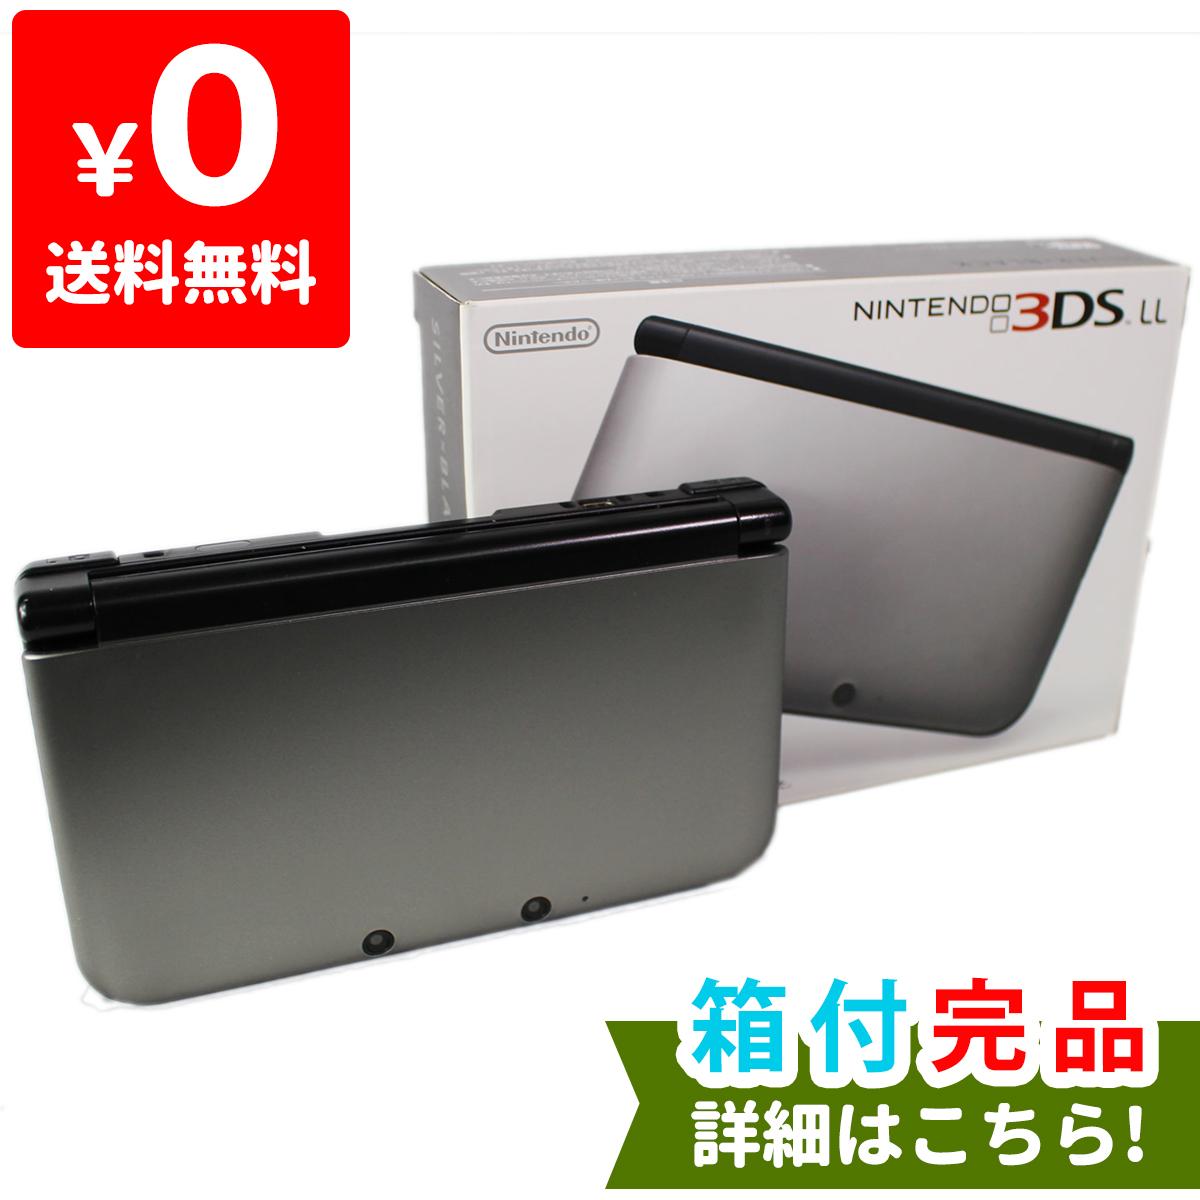 3DS LL シルバーXブラック 本体 ニンテンドー 任天堂 NINTENDO ゲーム機 中古 付属品完品 4902370519556 送料無料 【中古】